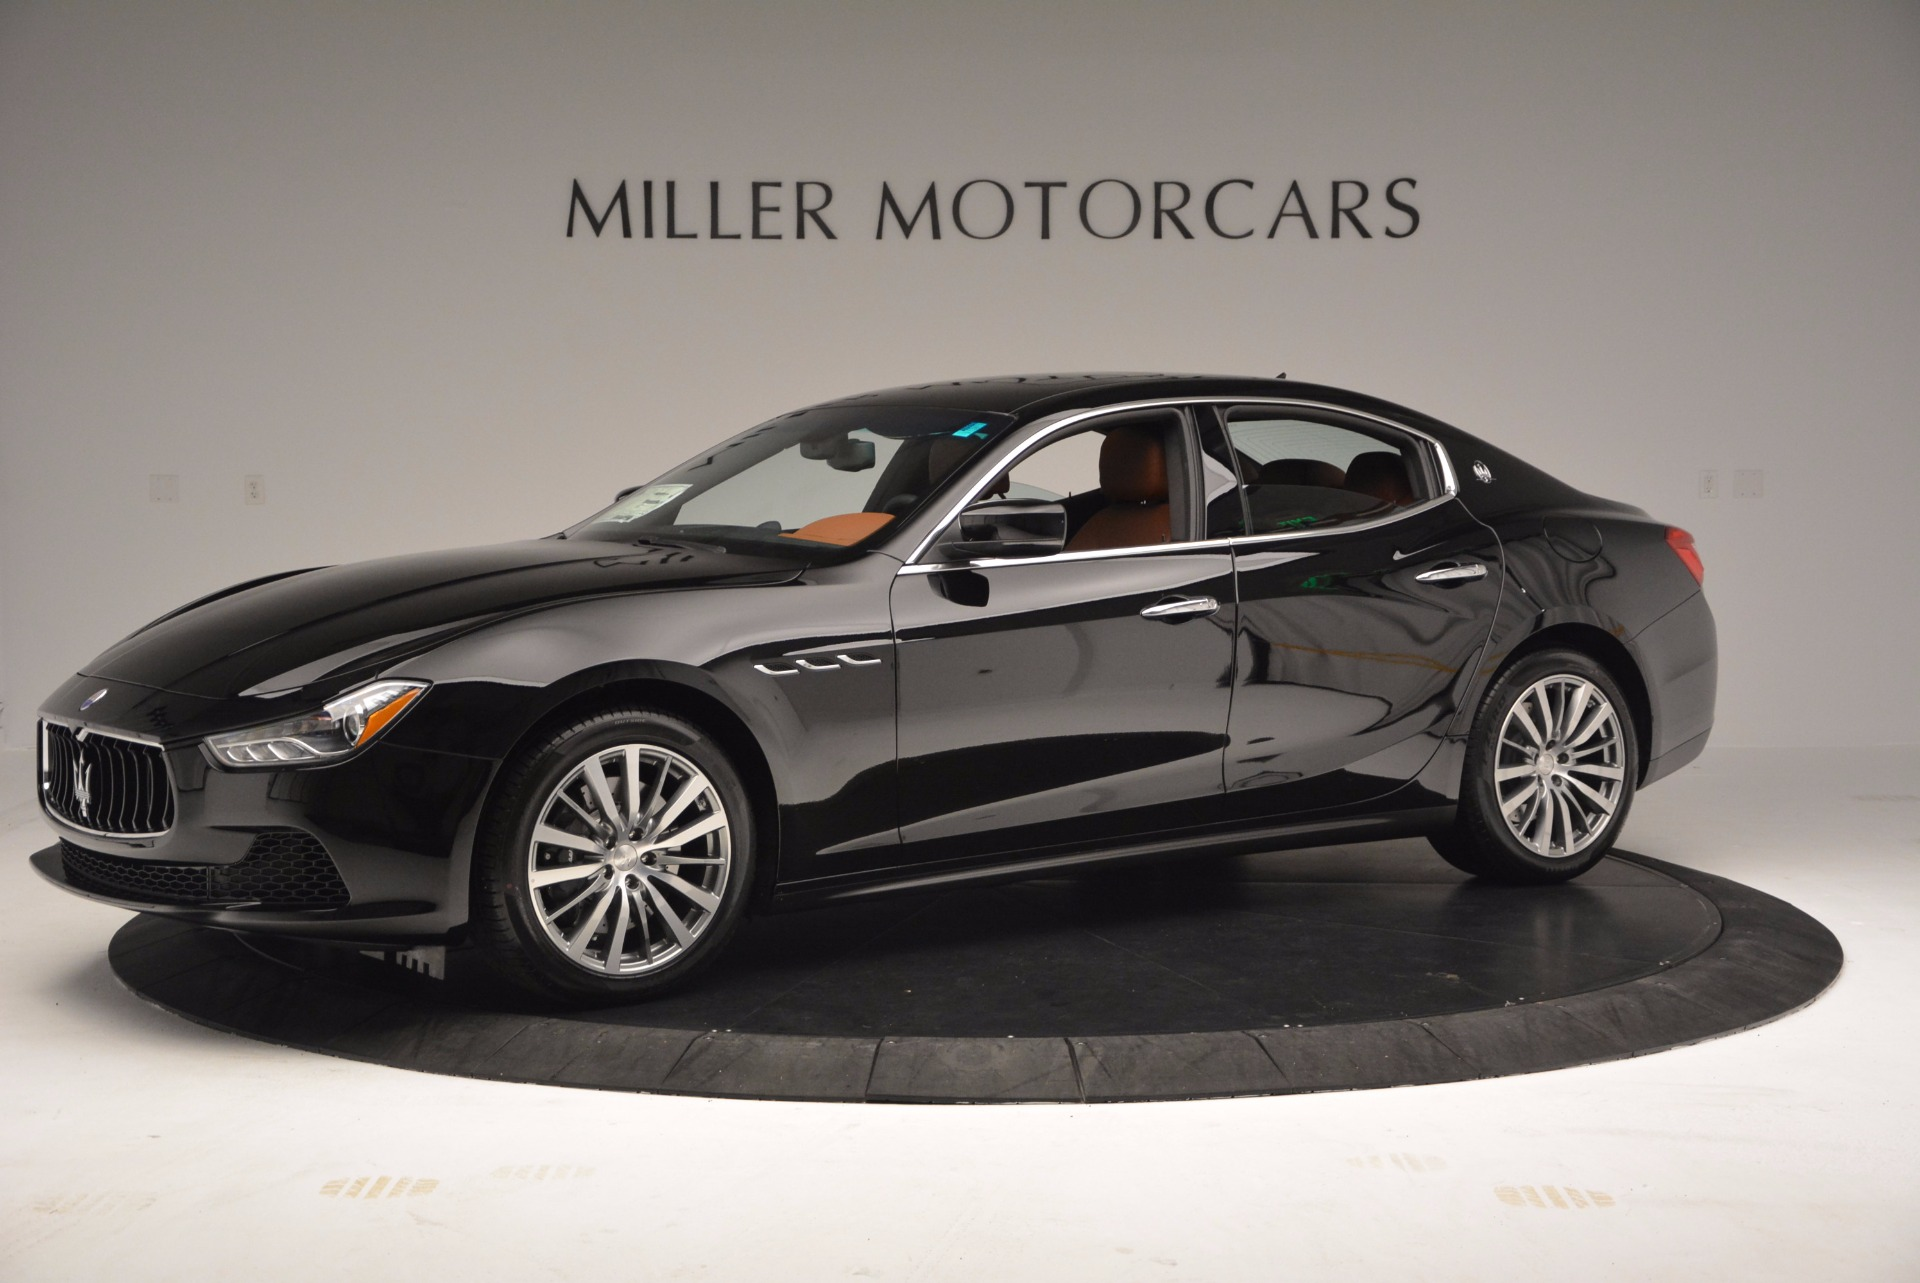 New 2017 Maserati Ghibli S Q4 EX-LOANER For Sale In Greenwich, CT. Alfa Romeo of Greenwich, M1859 1115_p2